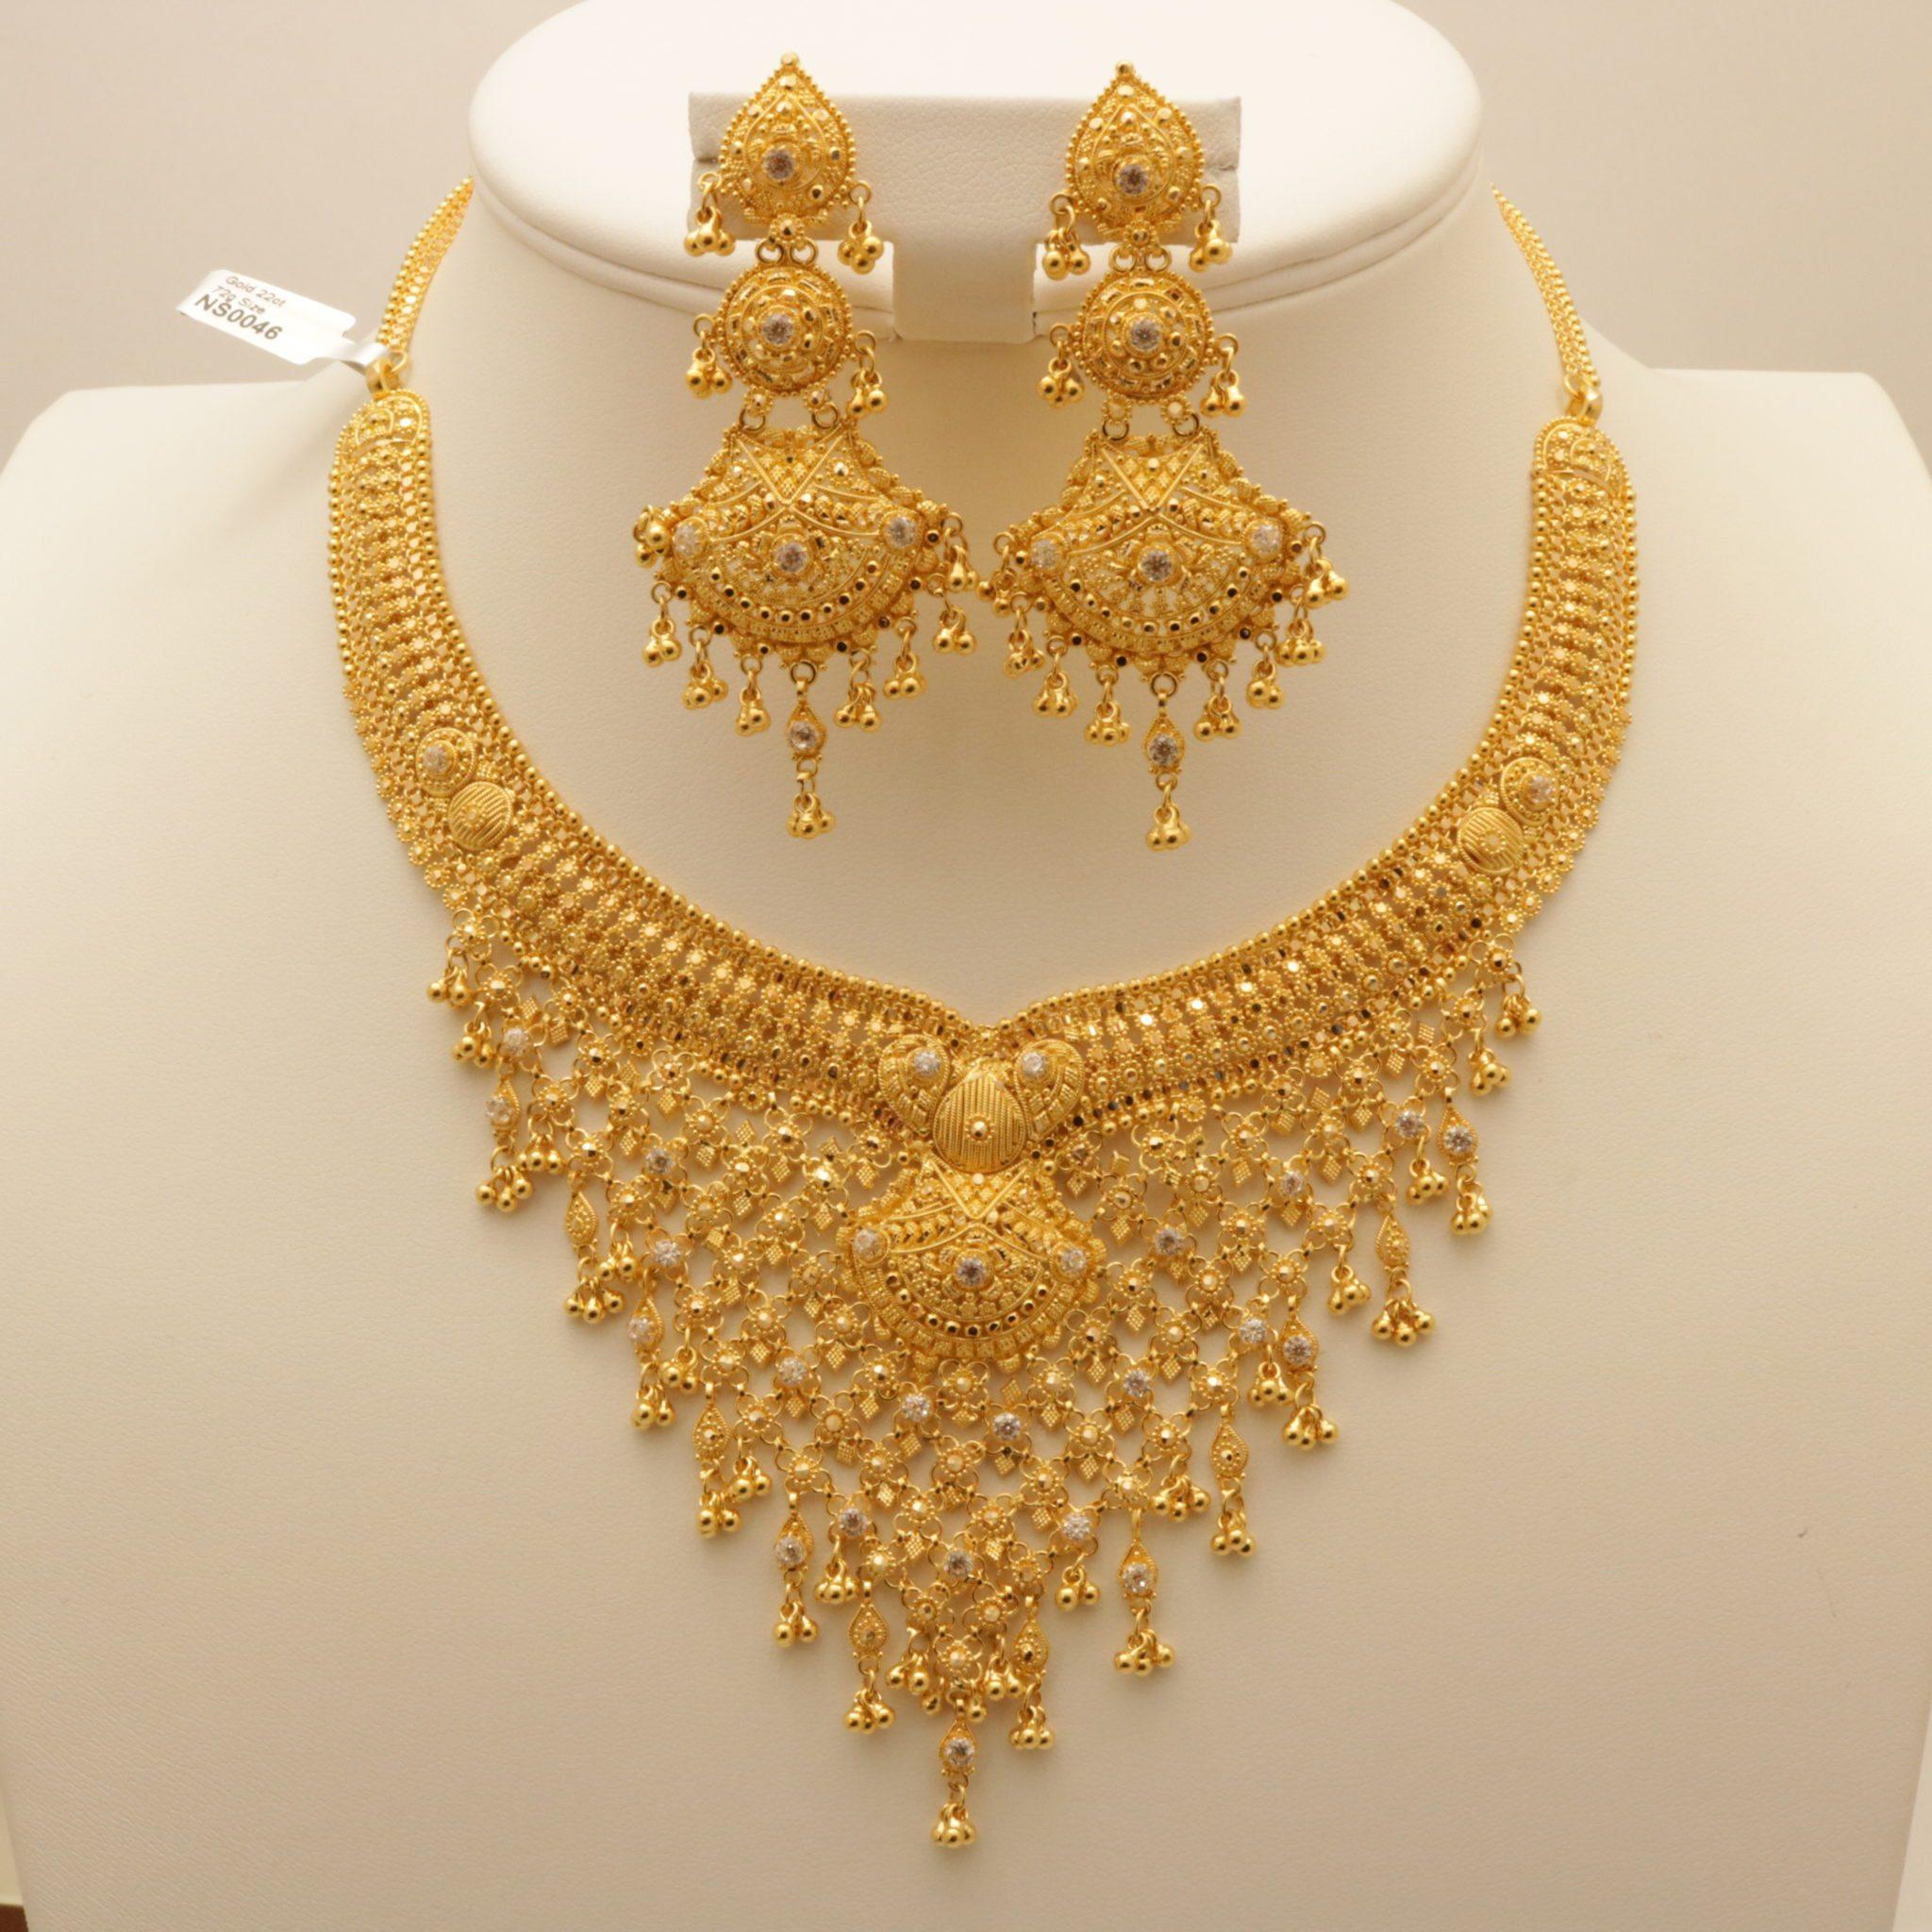 22 Carat Indian Gold Quot V Quot Shaped Necklace Set 72 Grams